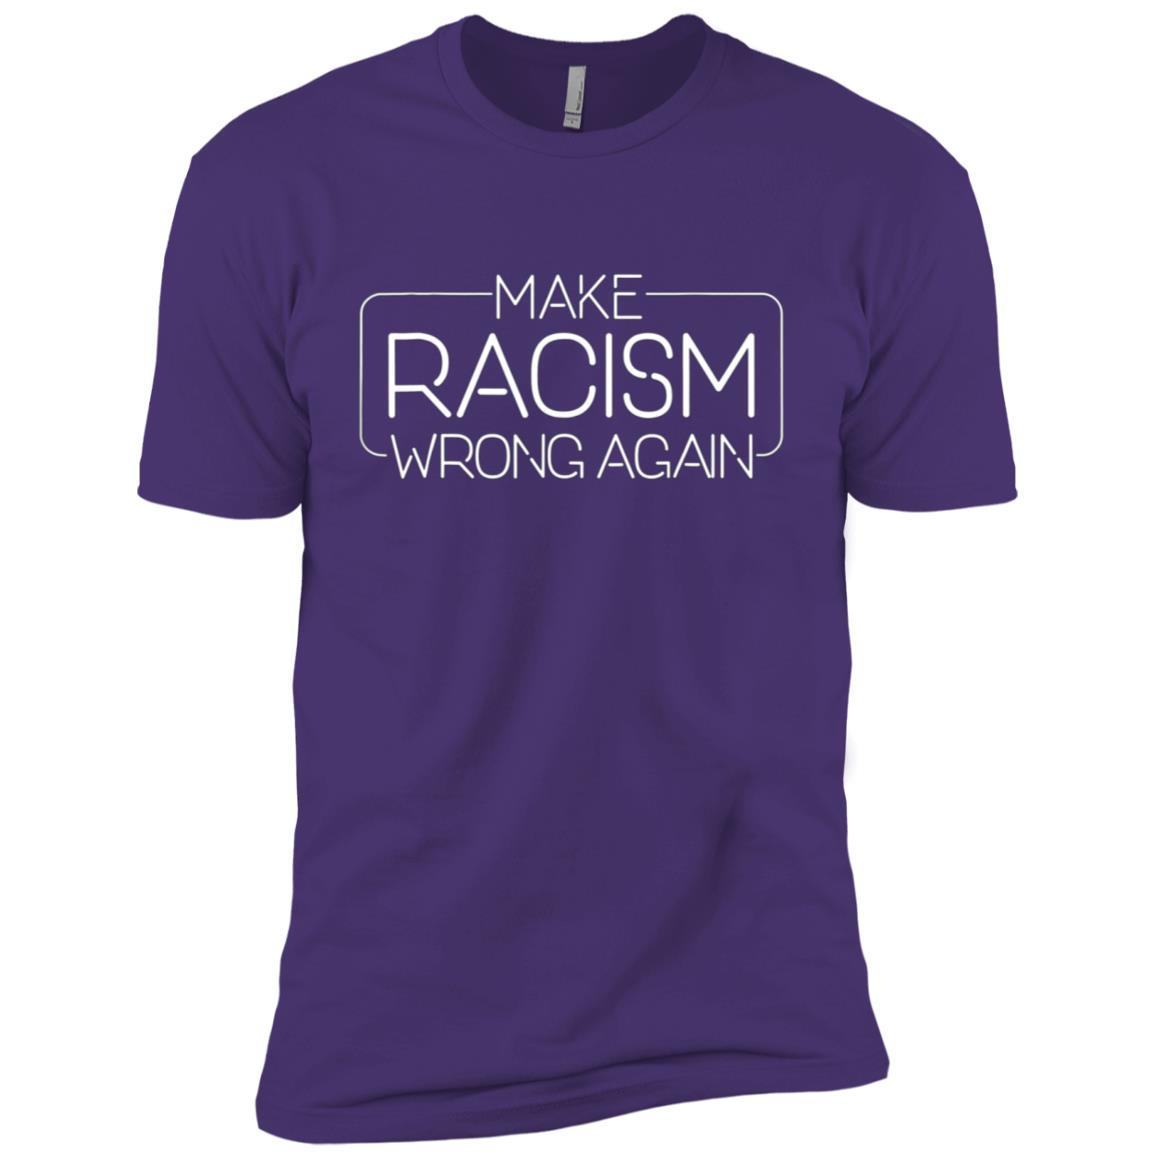 Make Racism Wrong Again – Unite Against Racism -2 Men Short Sleeve T-Shirt